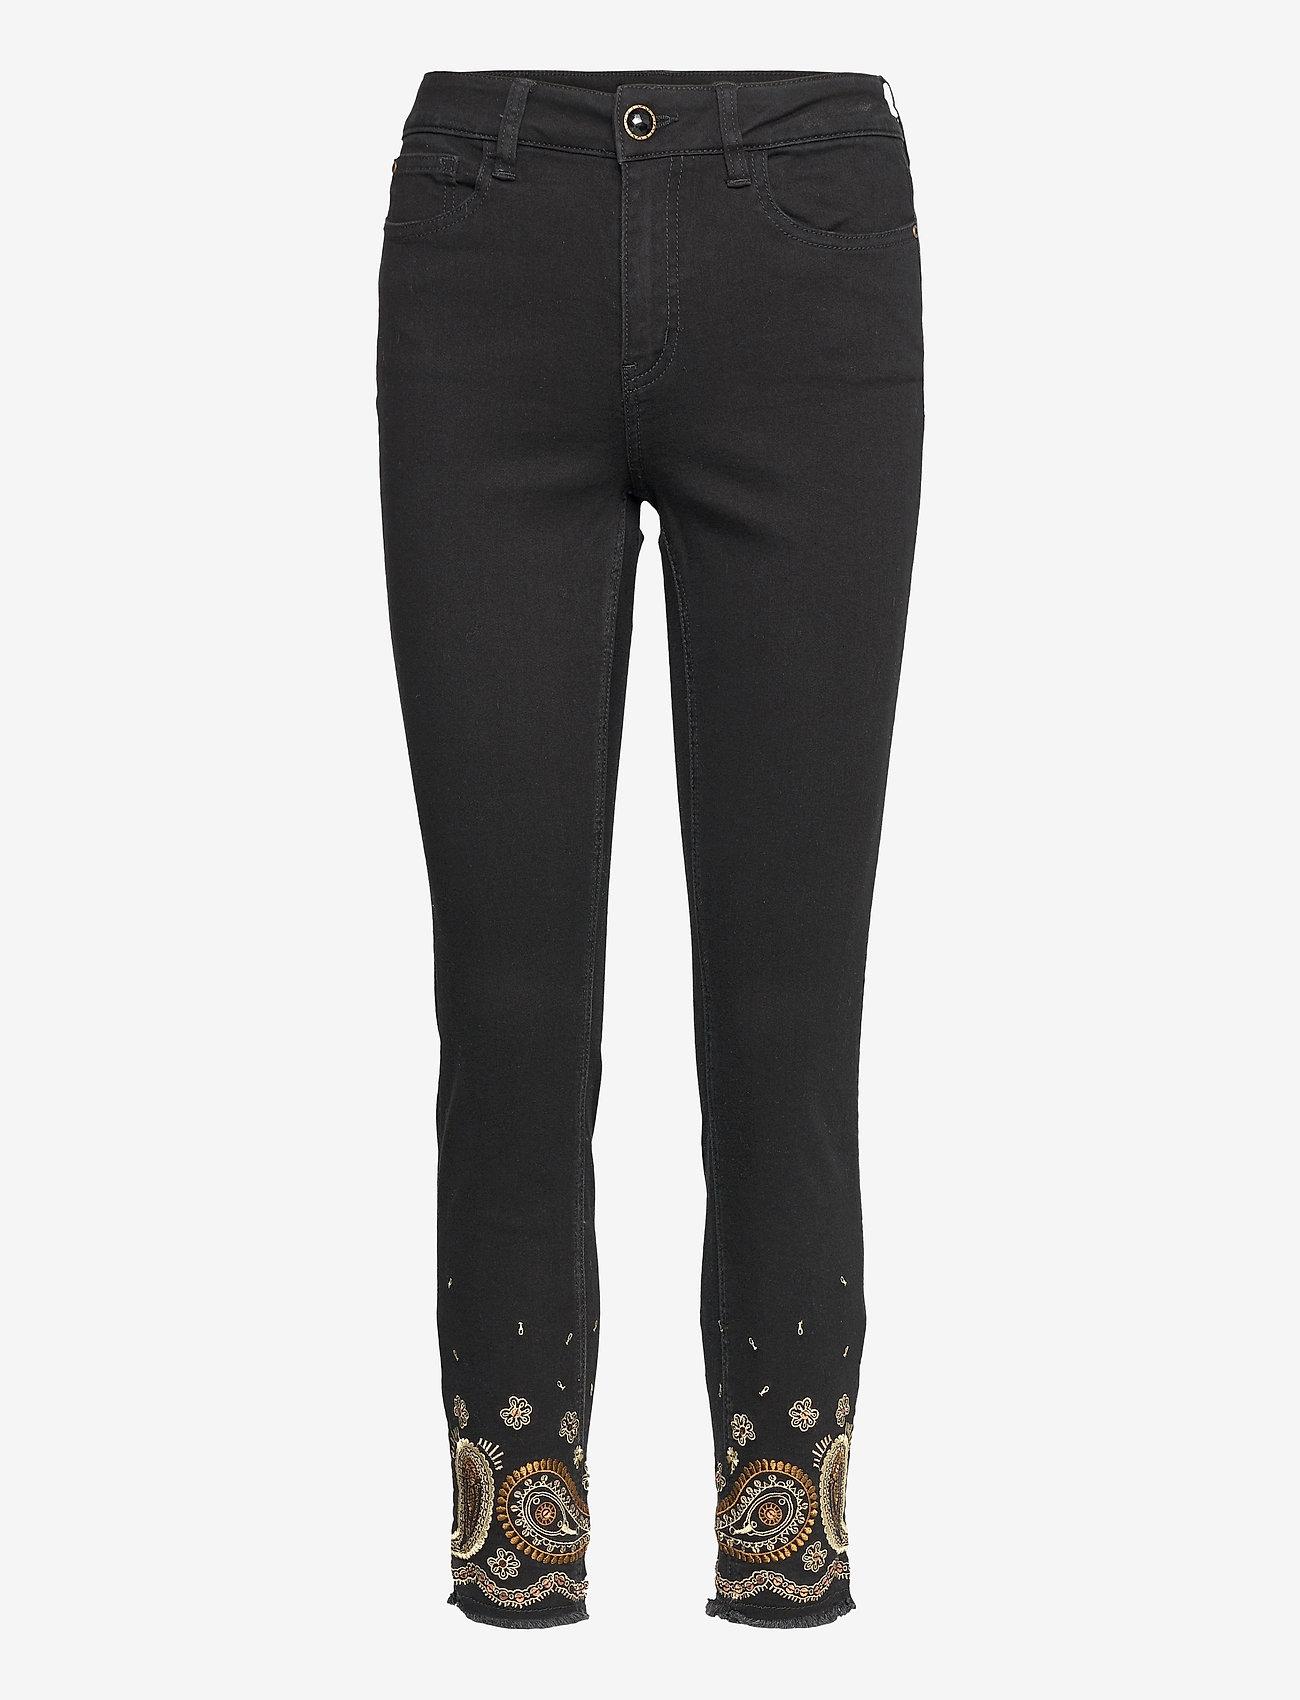 Desigual - DENIM BELGICA - skinny jeans - negro - 0